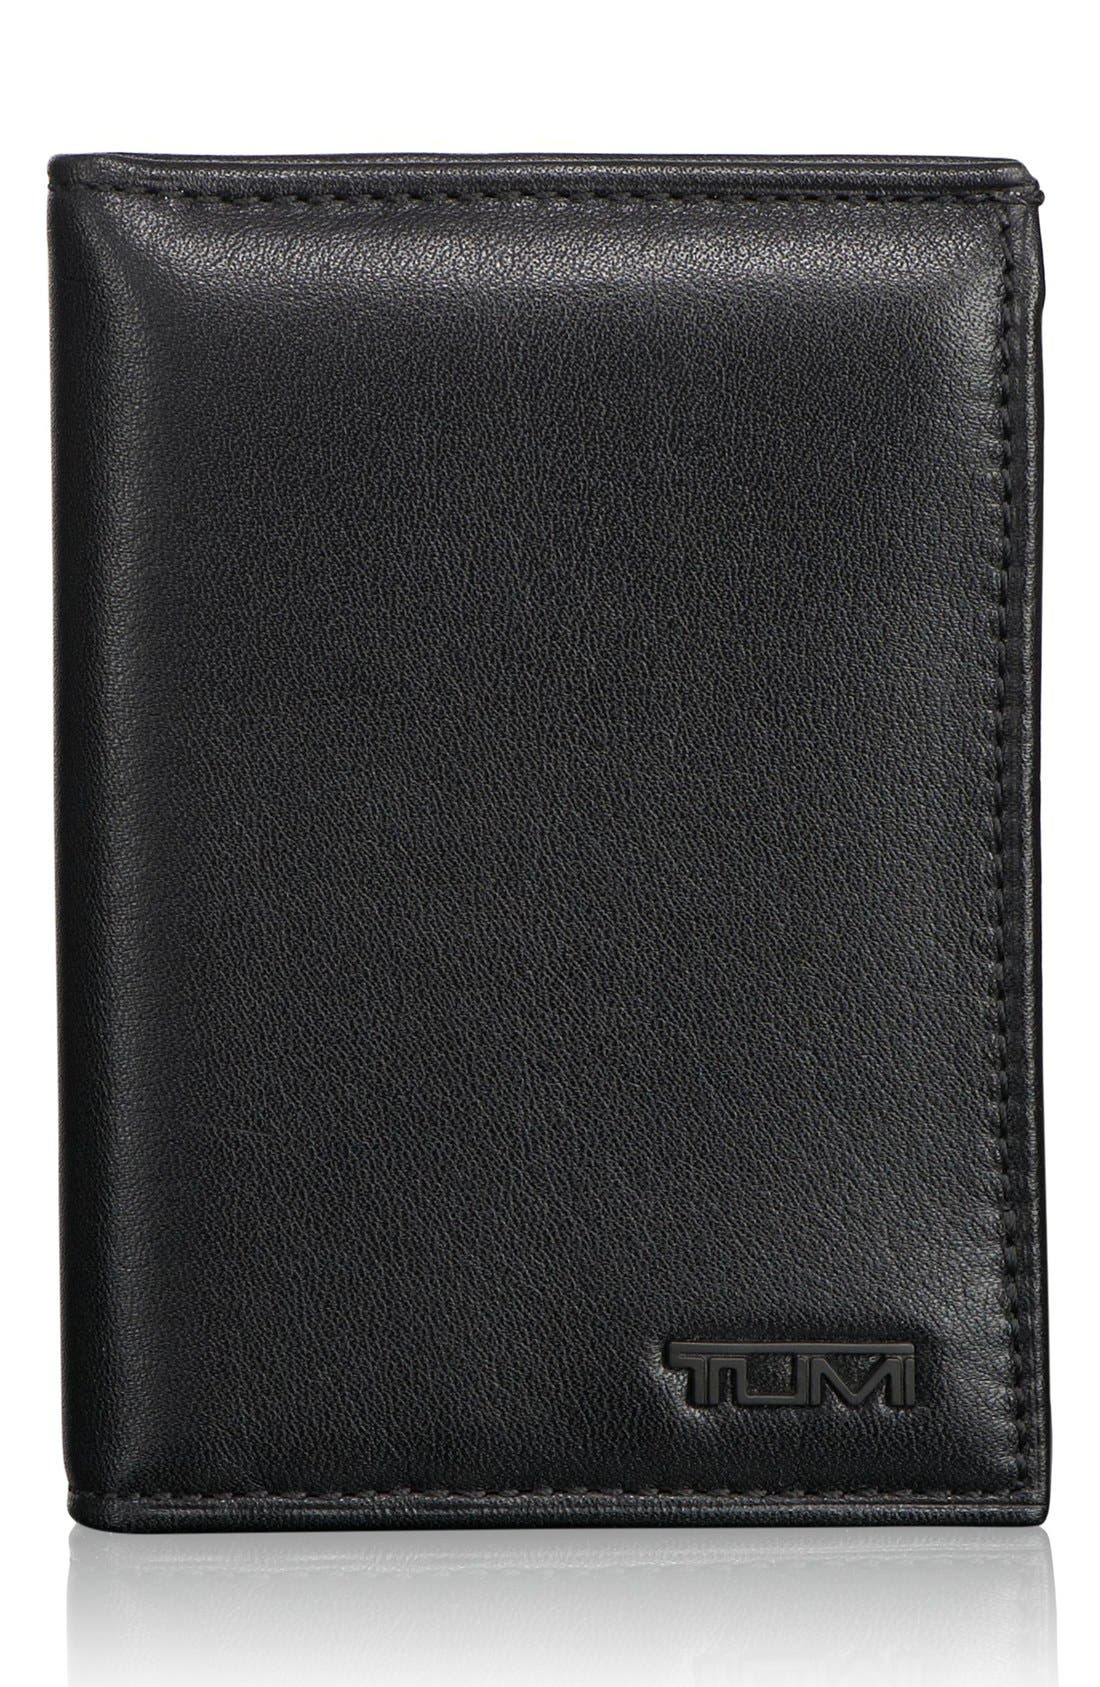 Alternate Image 1 Selected - Tumi 'Delta - ID Lock' Shielded L-Fold ID Wallet